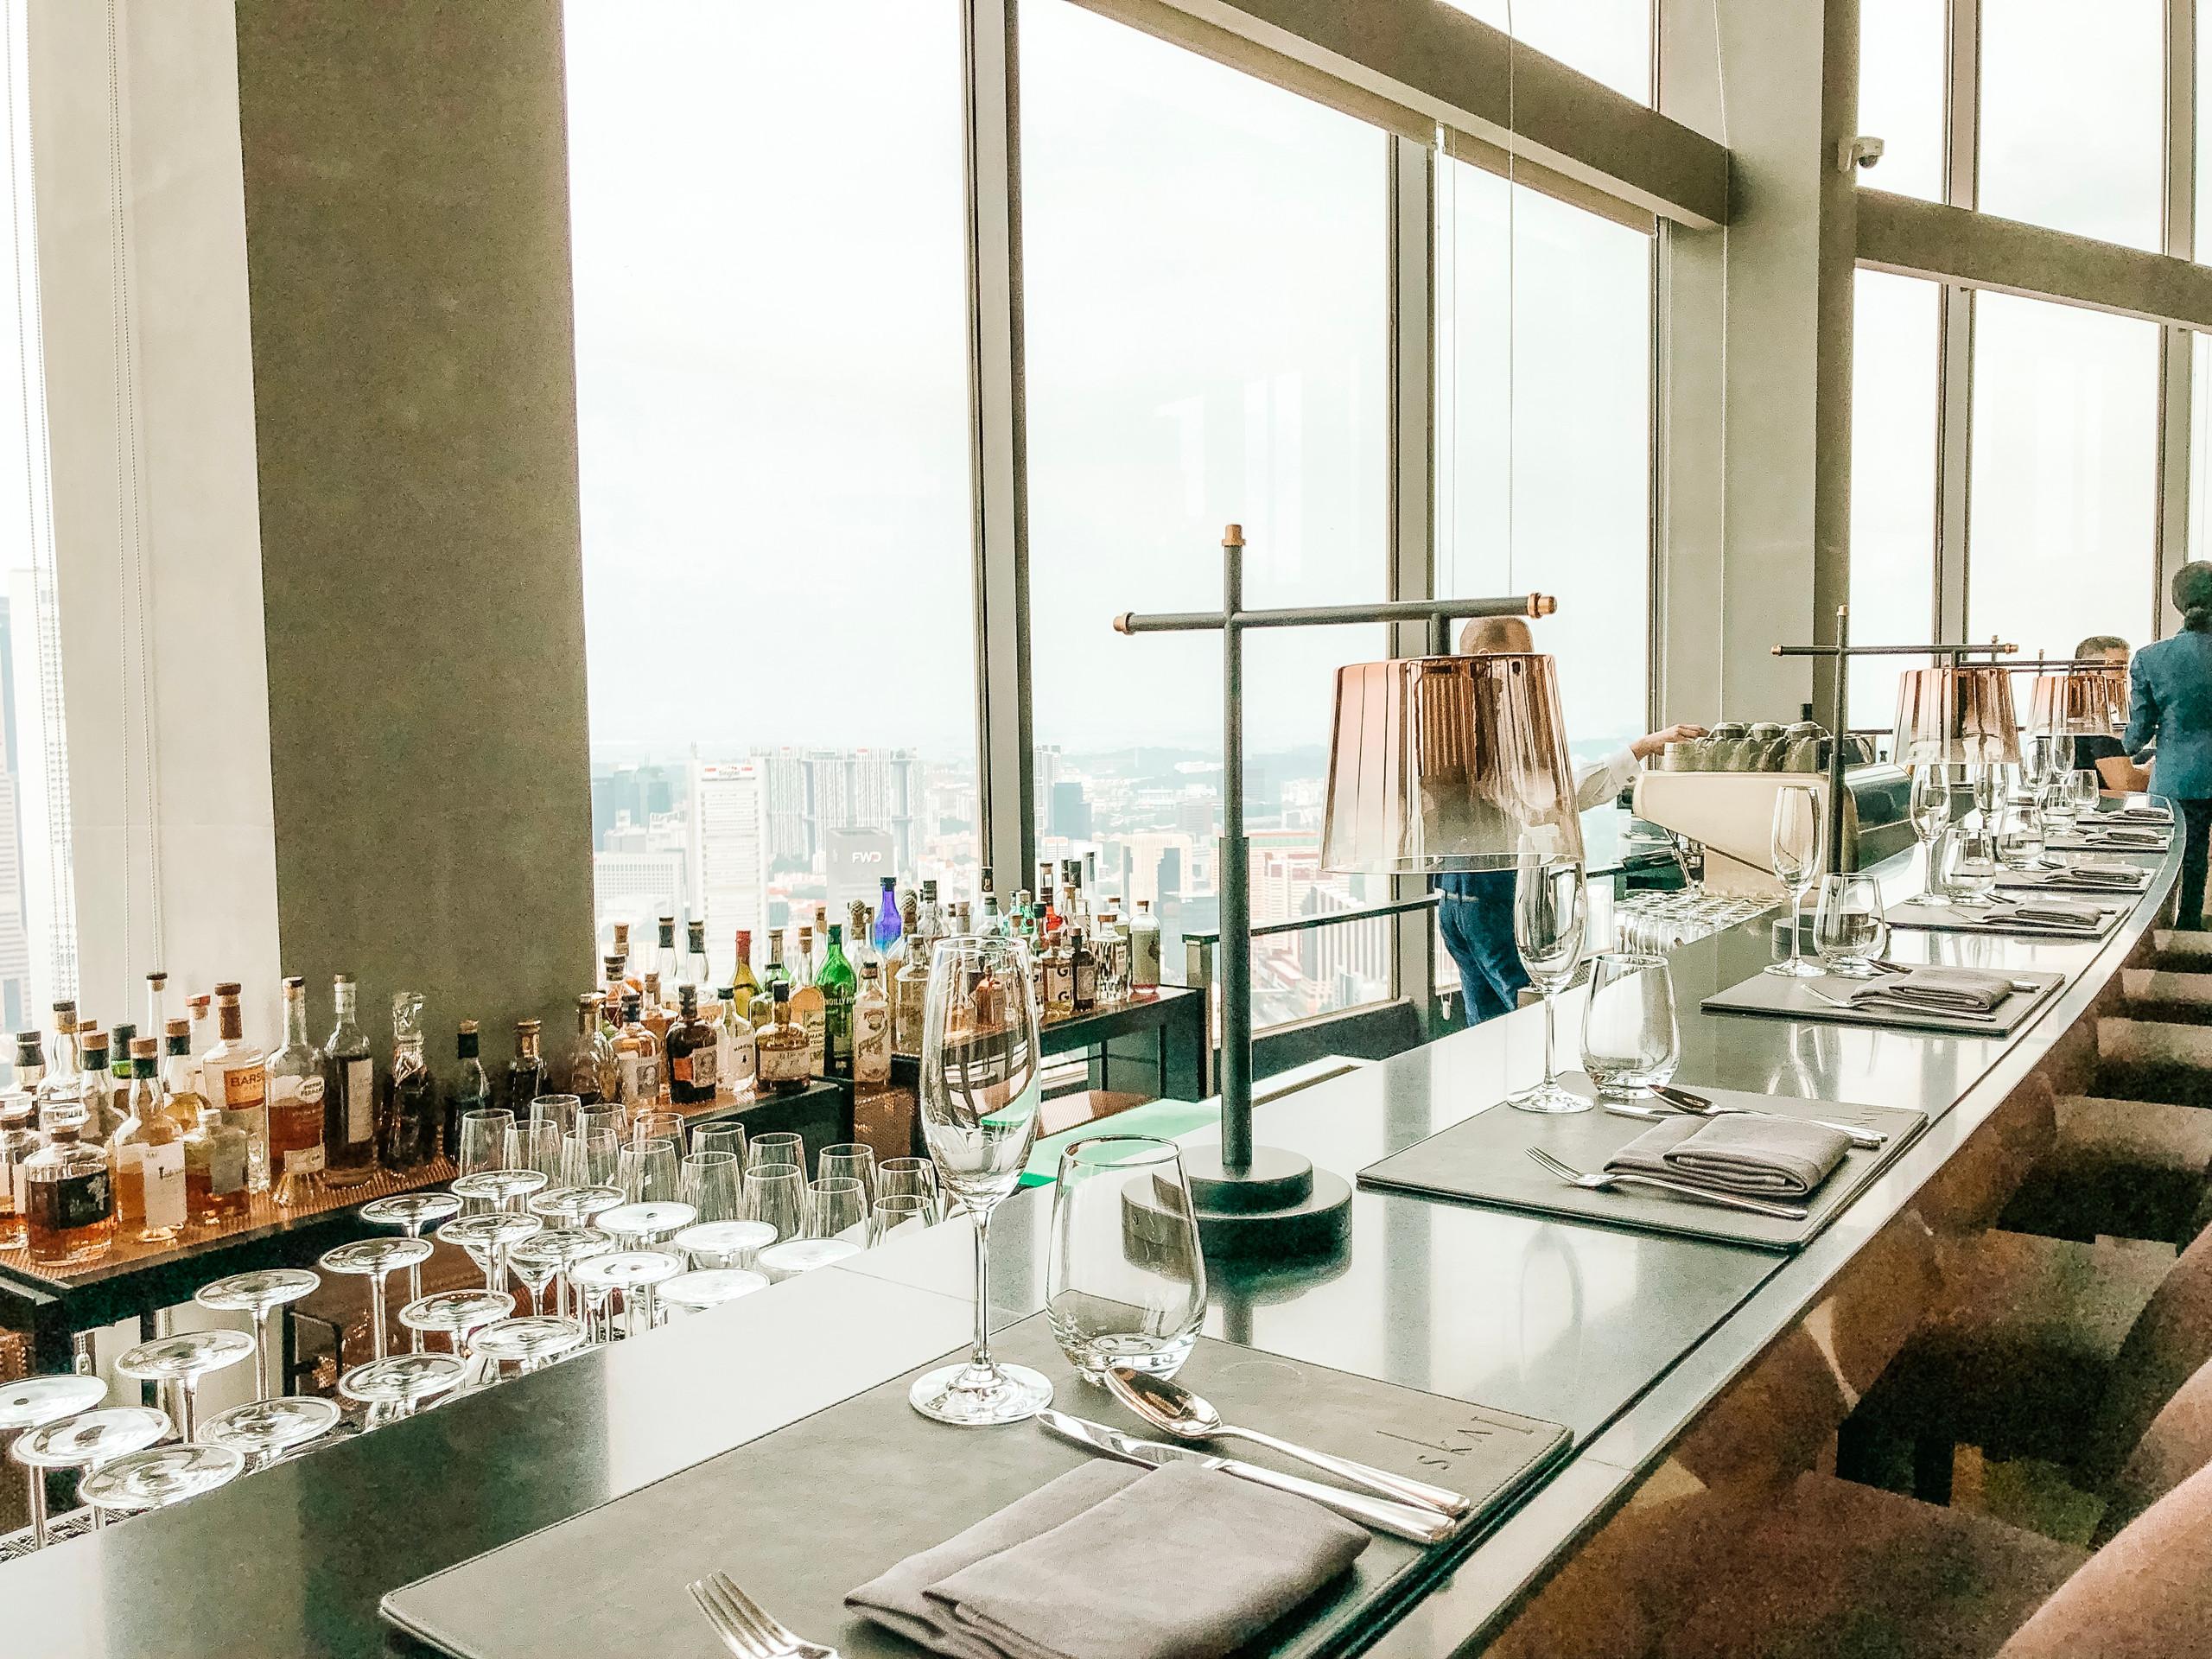 SKAI Bar and restaurant champagne buffet brunch Swissotel the stamford Singapore